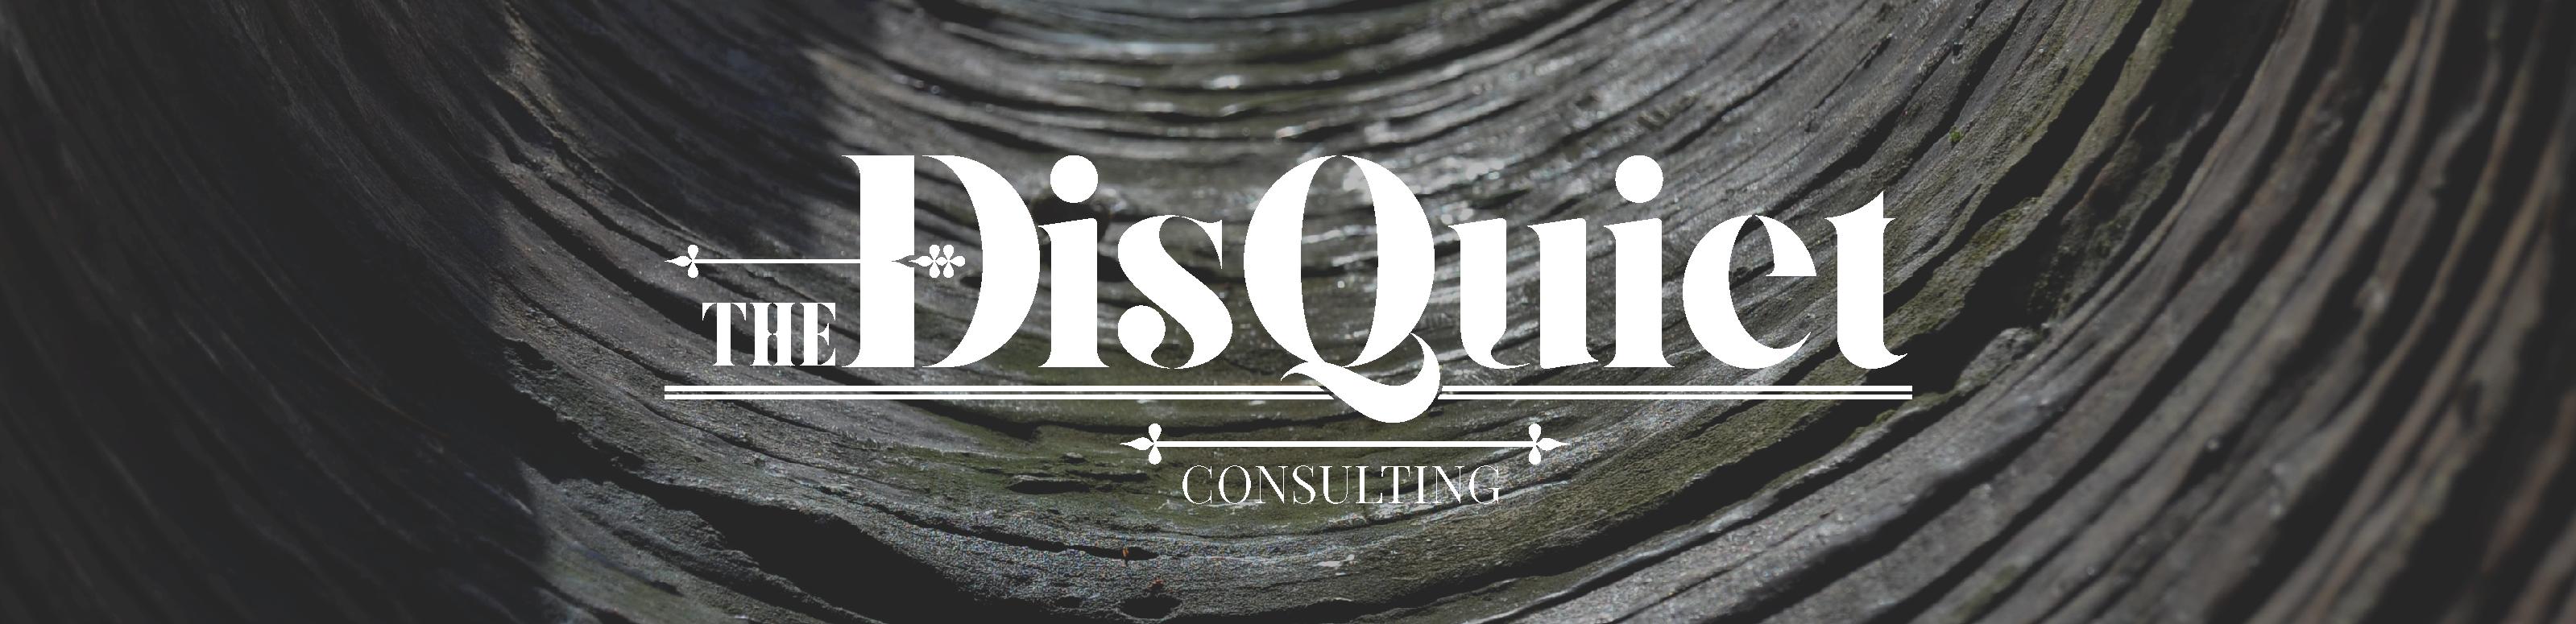 thedisquiet-consulting